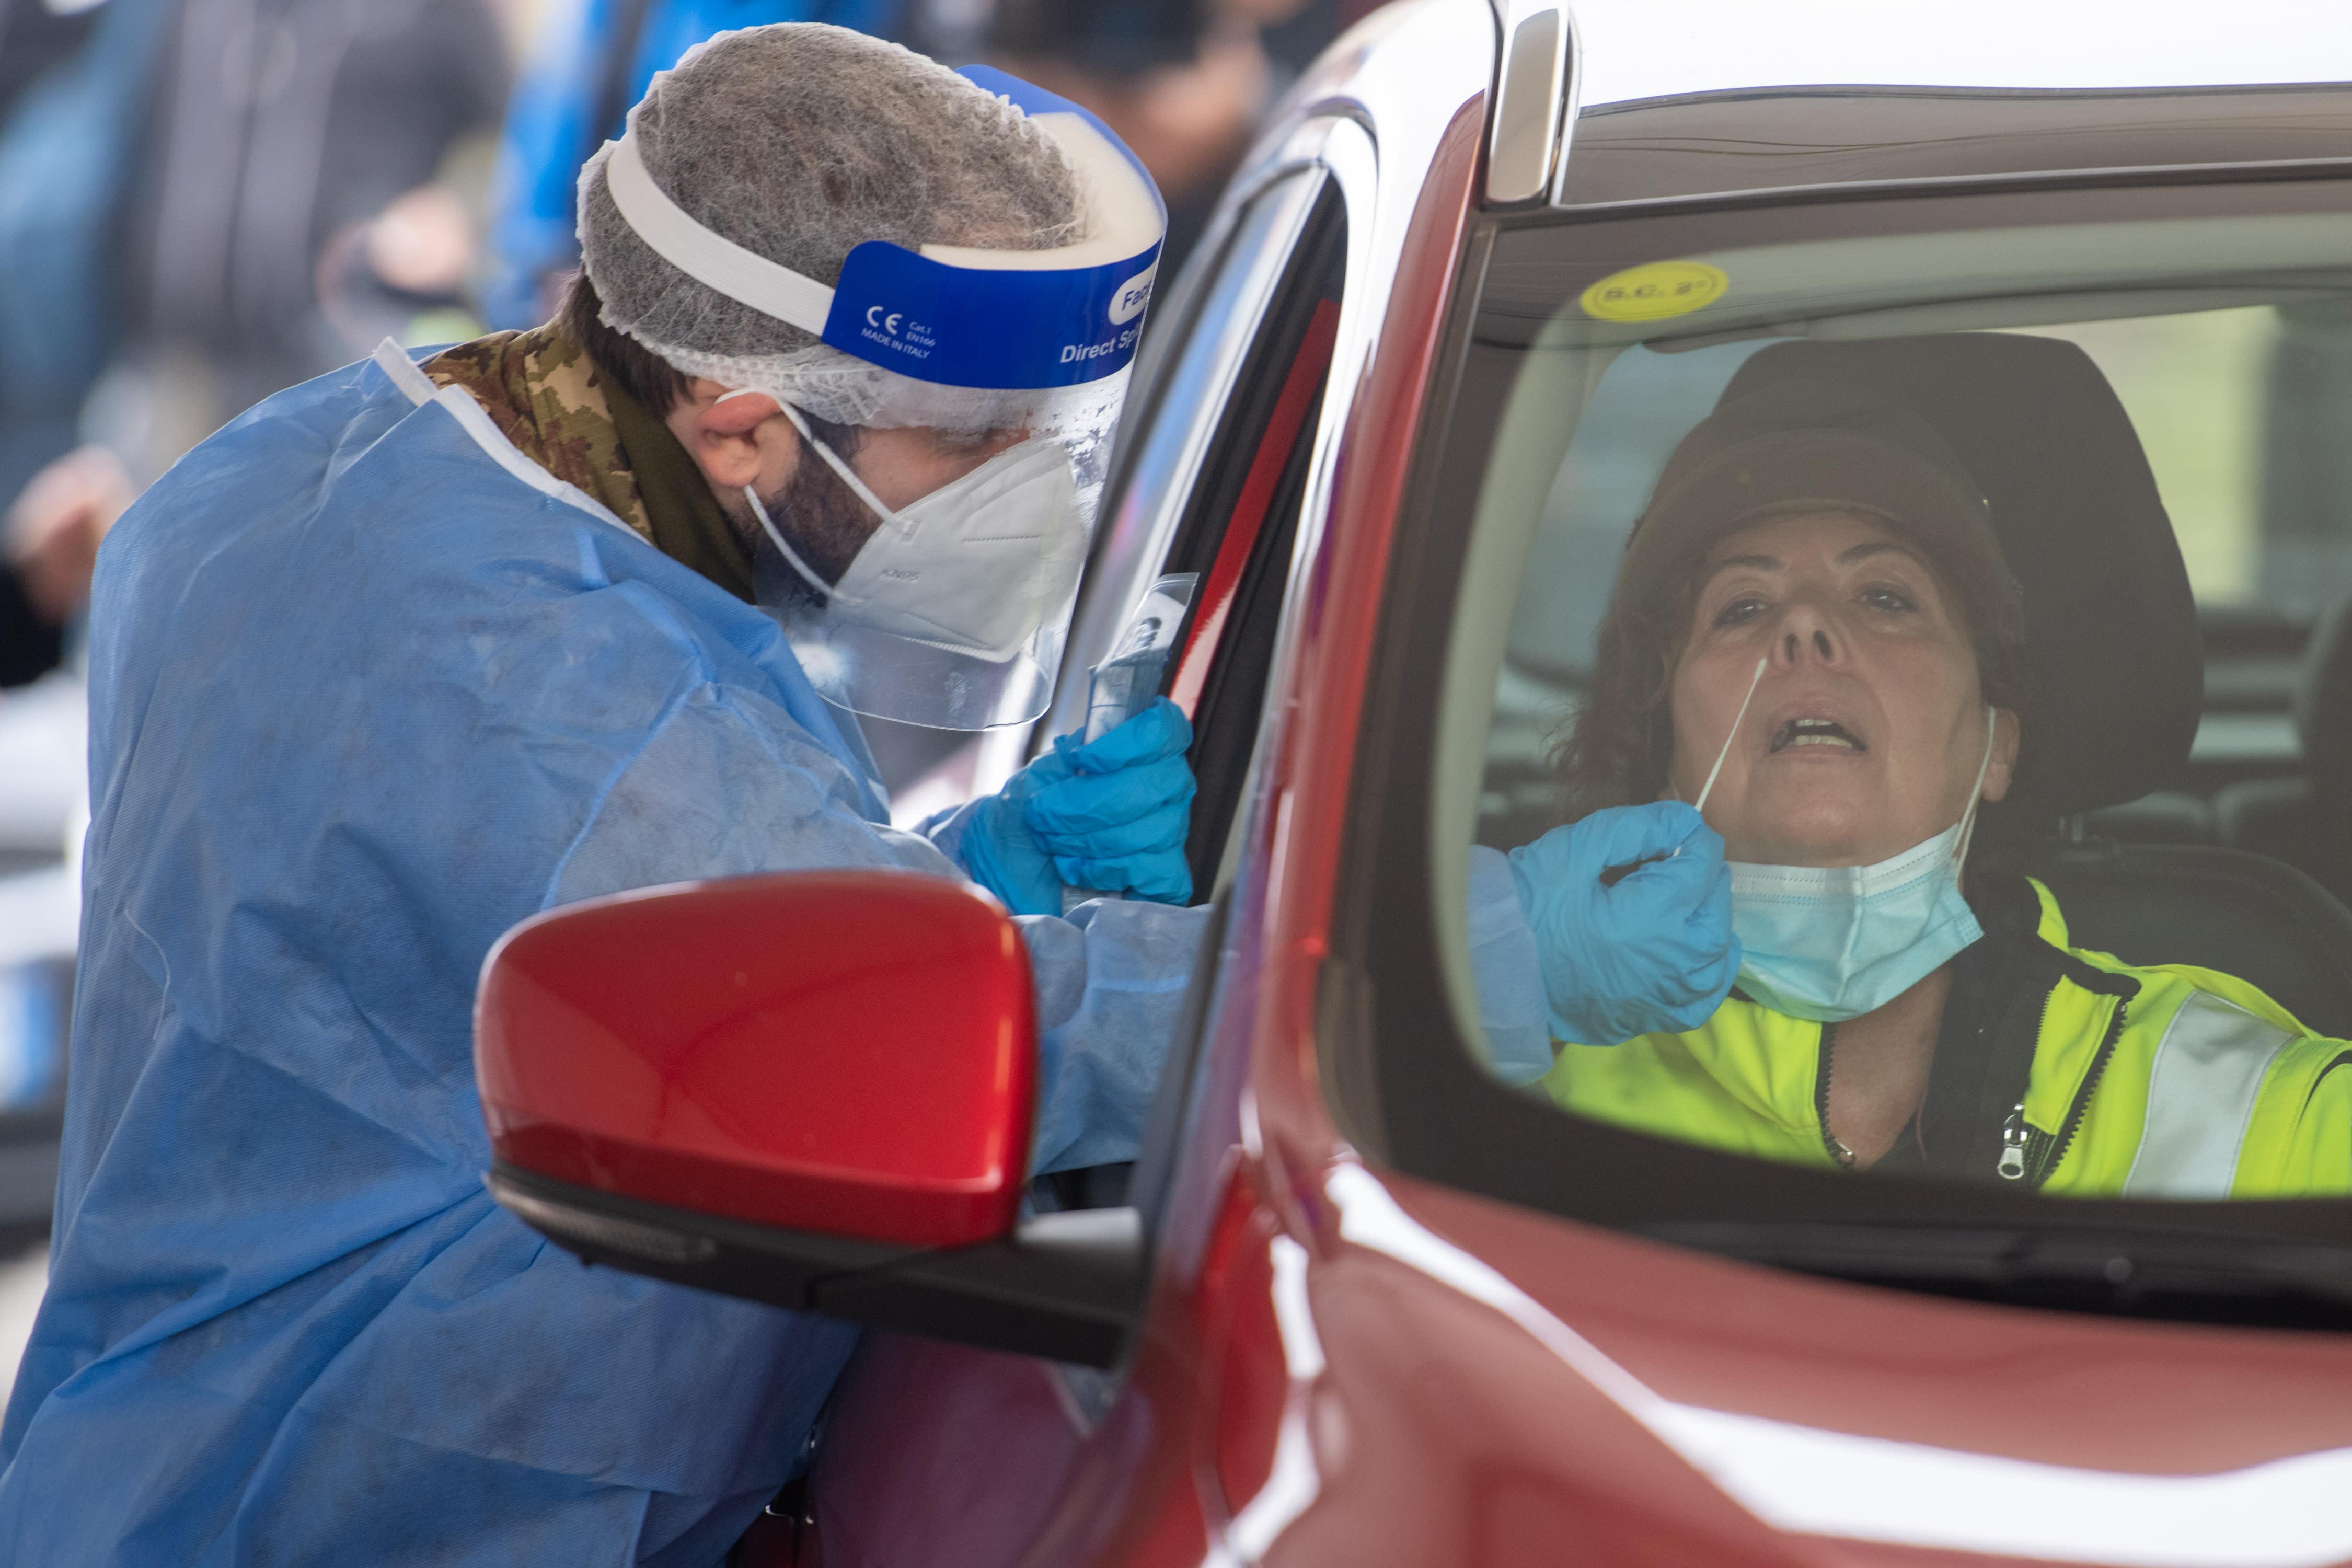 Expert: 'People should be worried' about virus variants